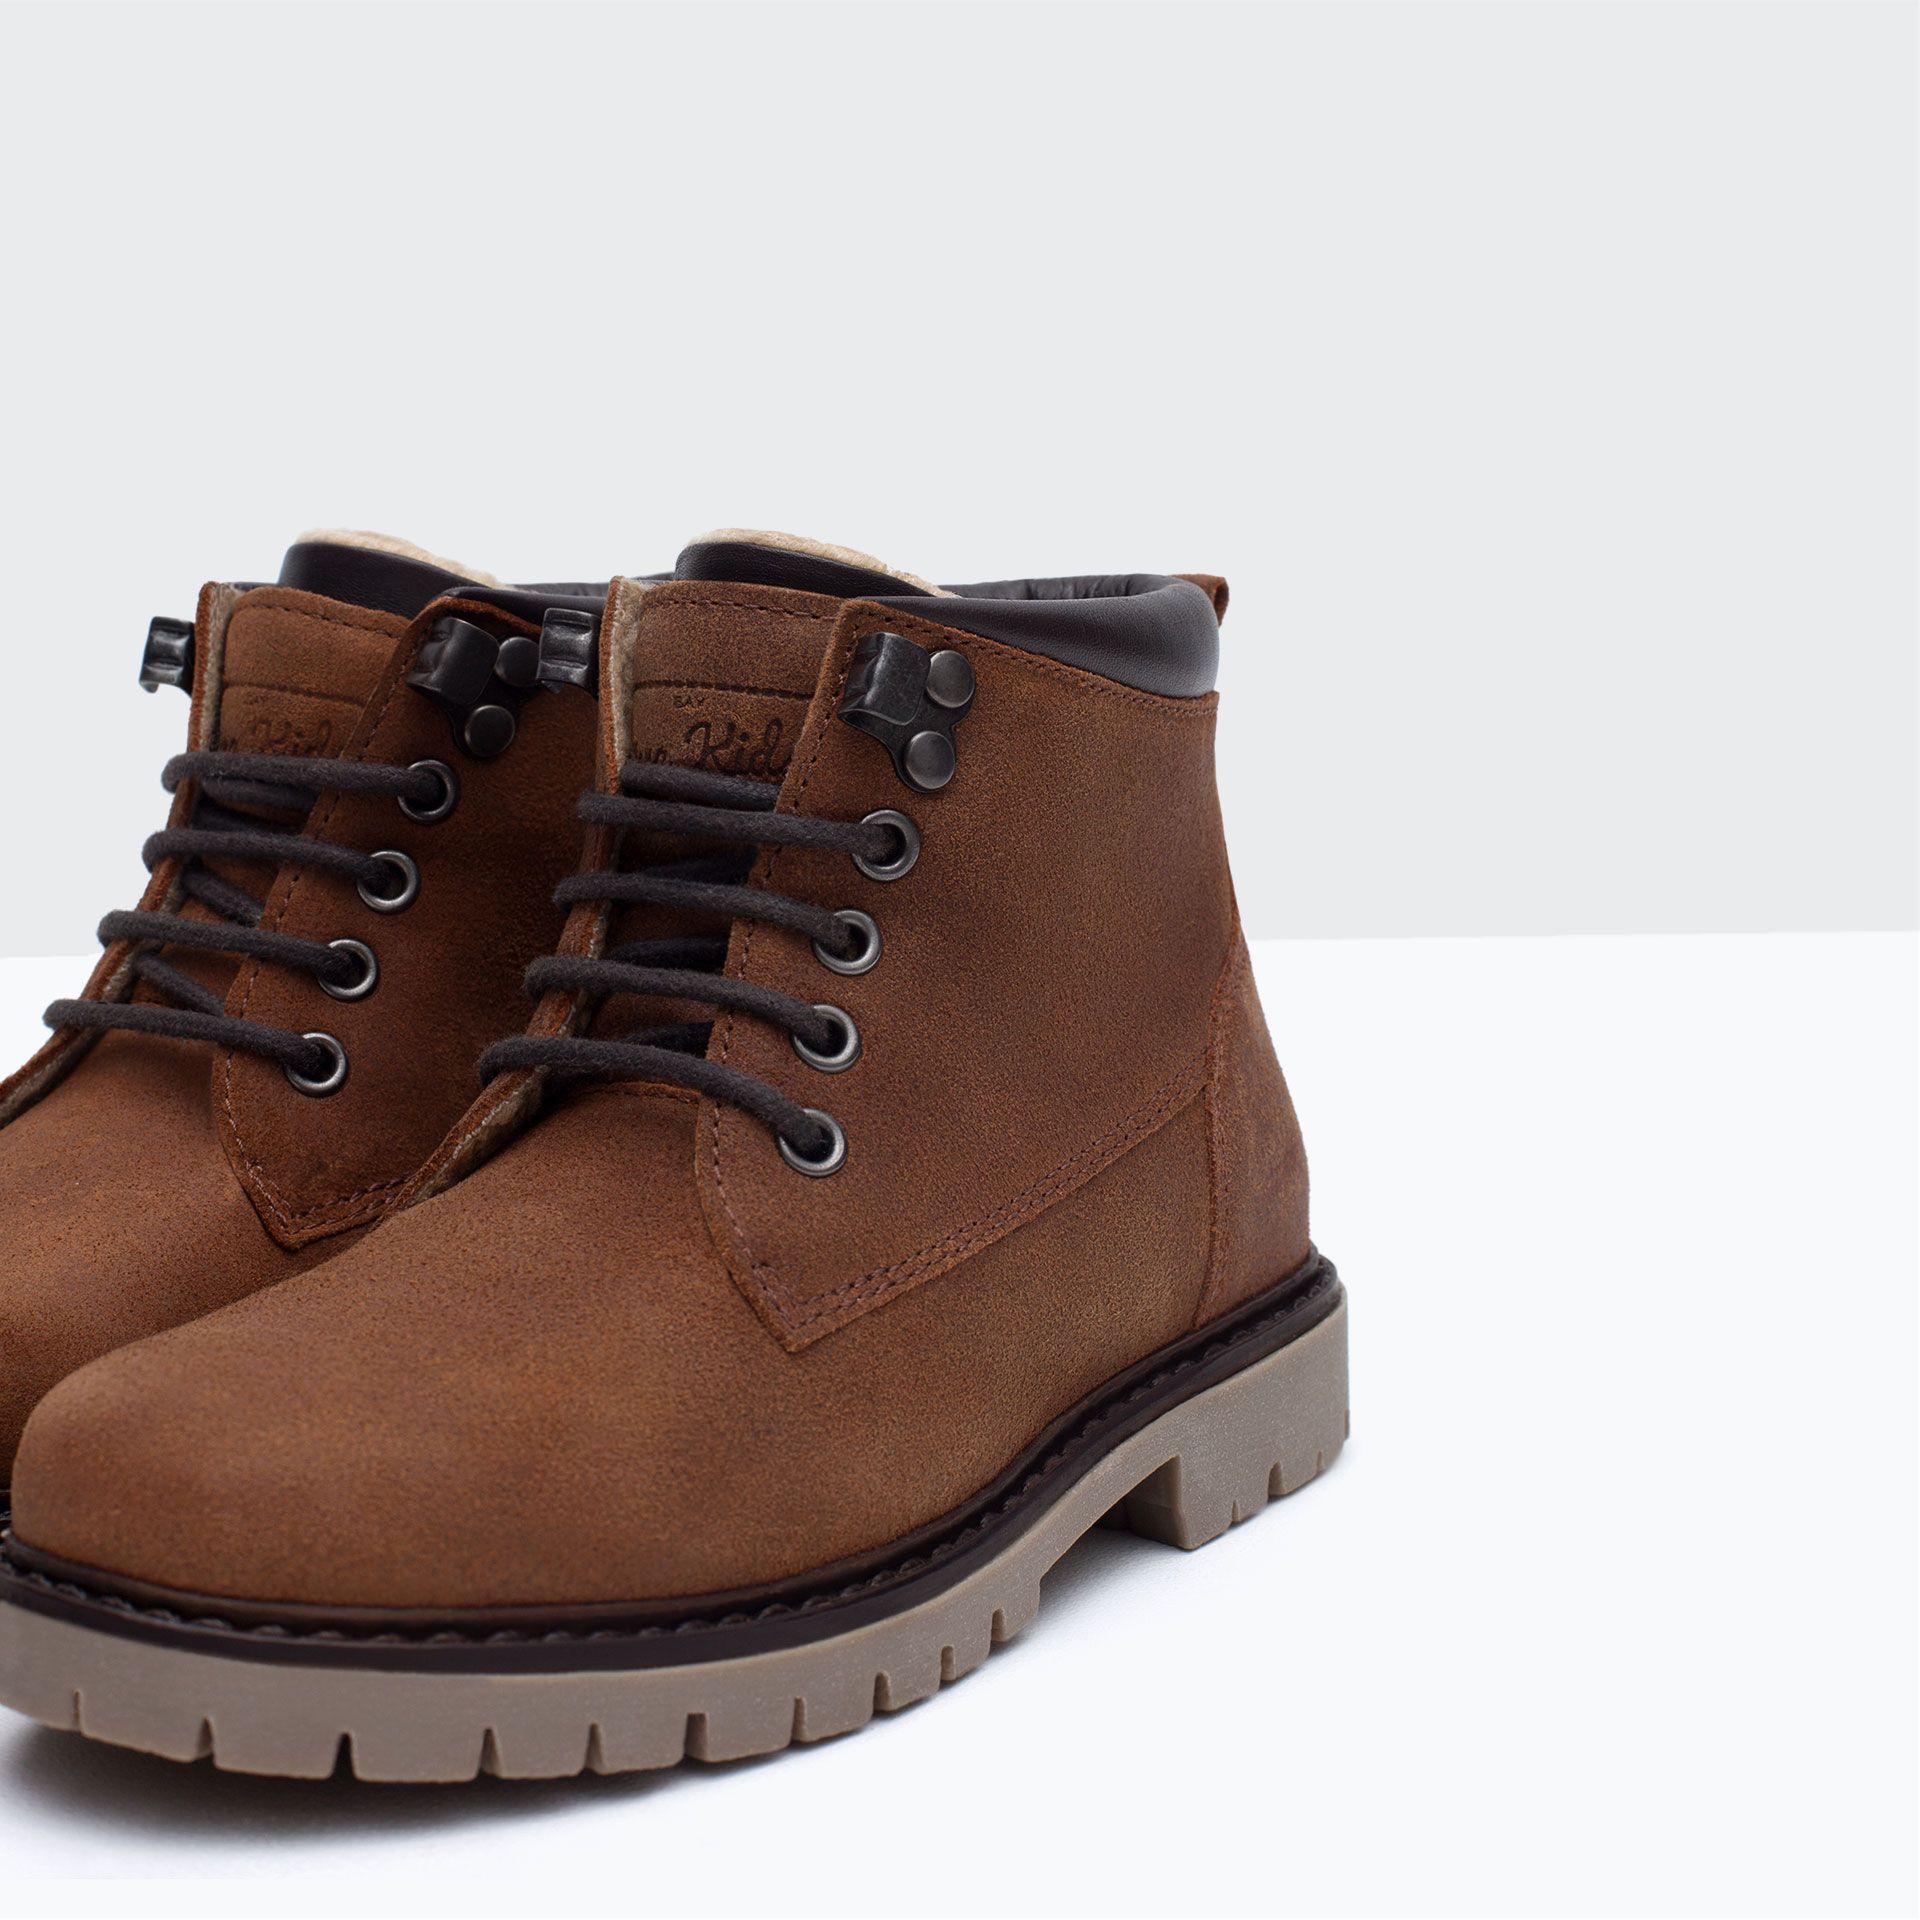 Zapatos España Niño4 Piel 14 Niños Años Worker Bota Zara 92EHWDI